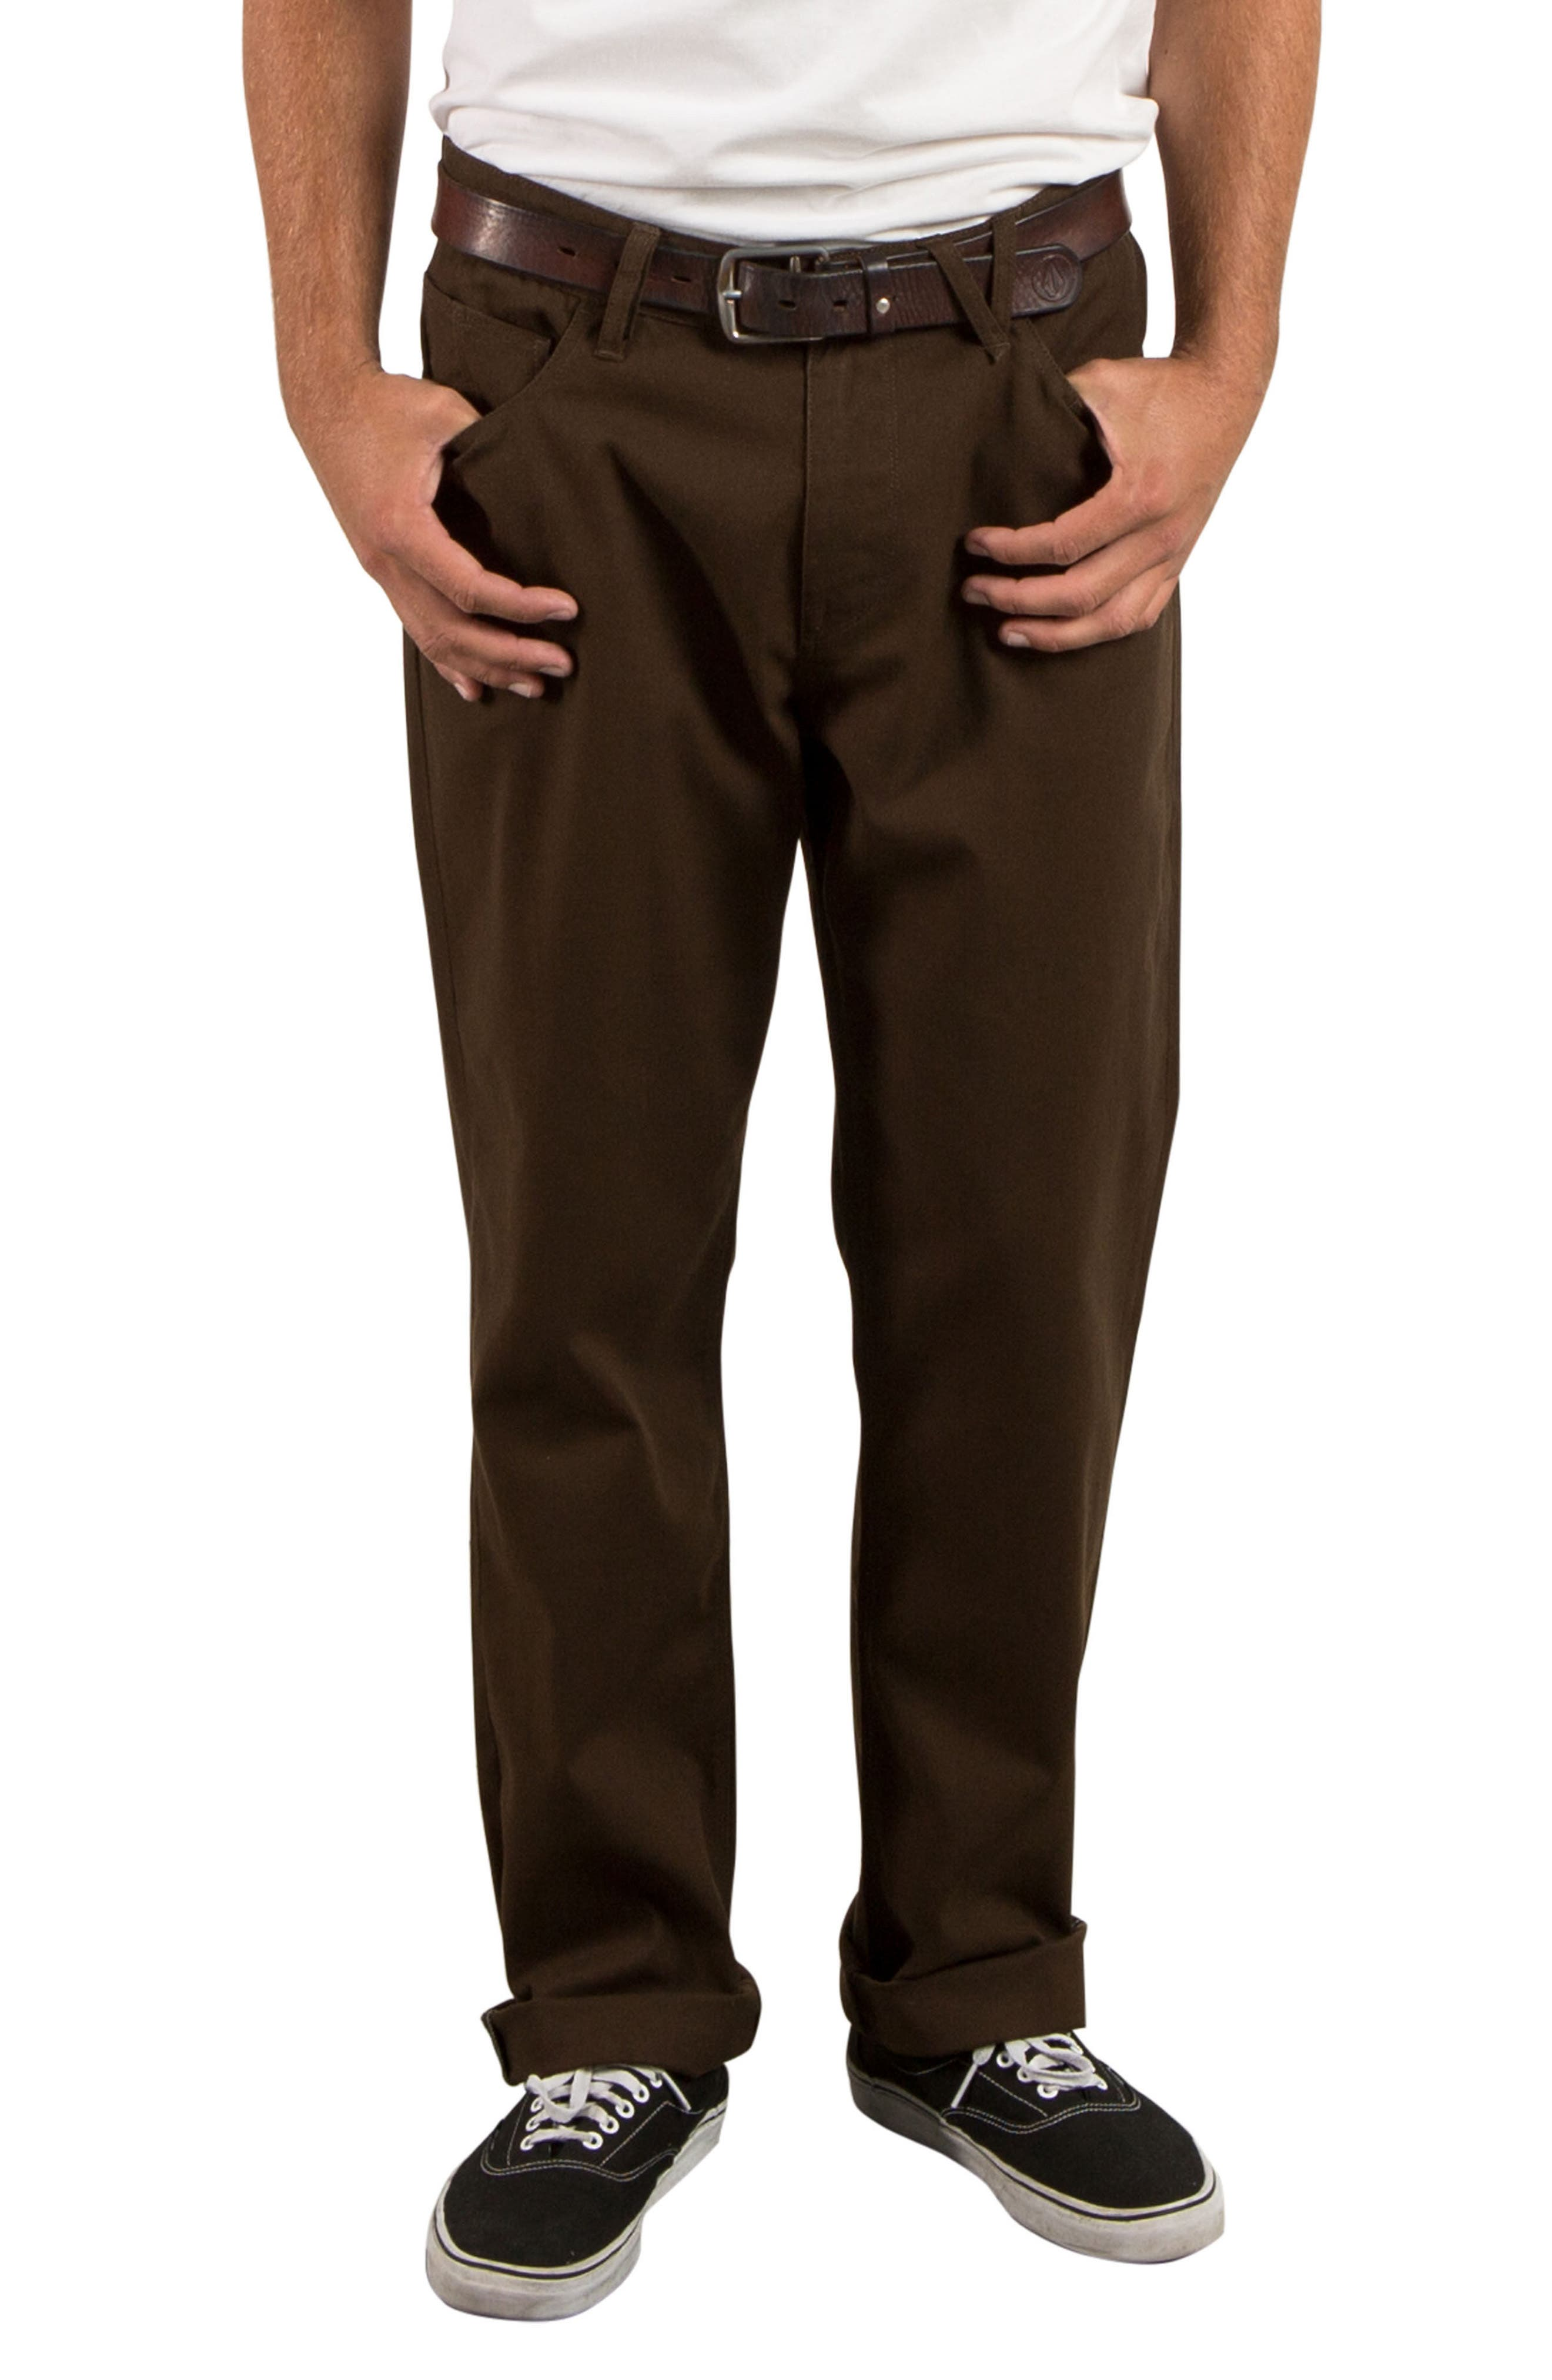 Kinkade Five-Pocket Thrifter Pants,                             Main thumbnail 1, color,                             Dark Chocolate